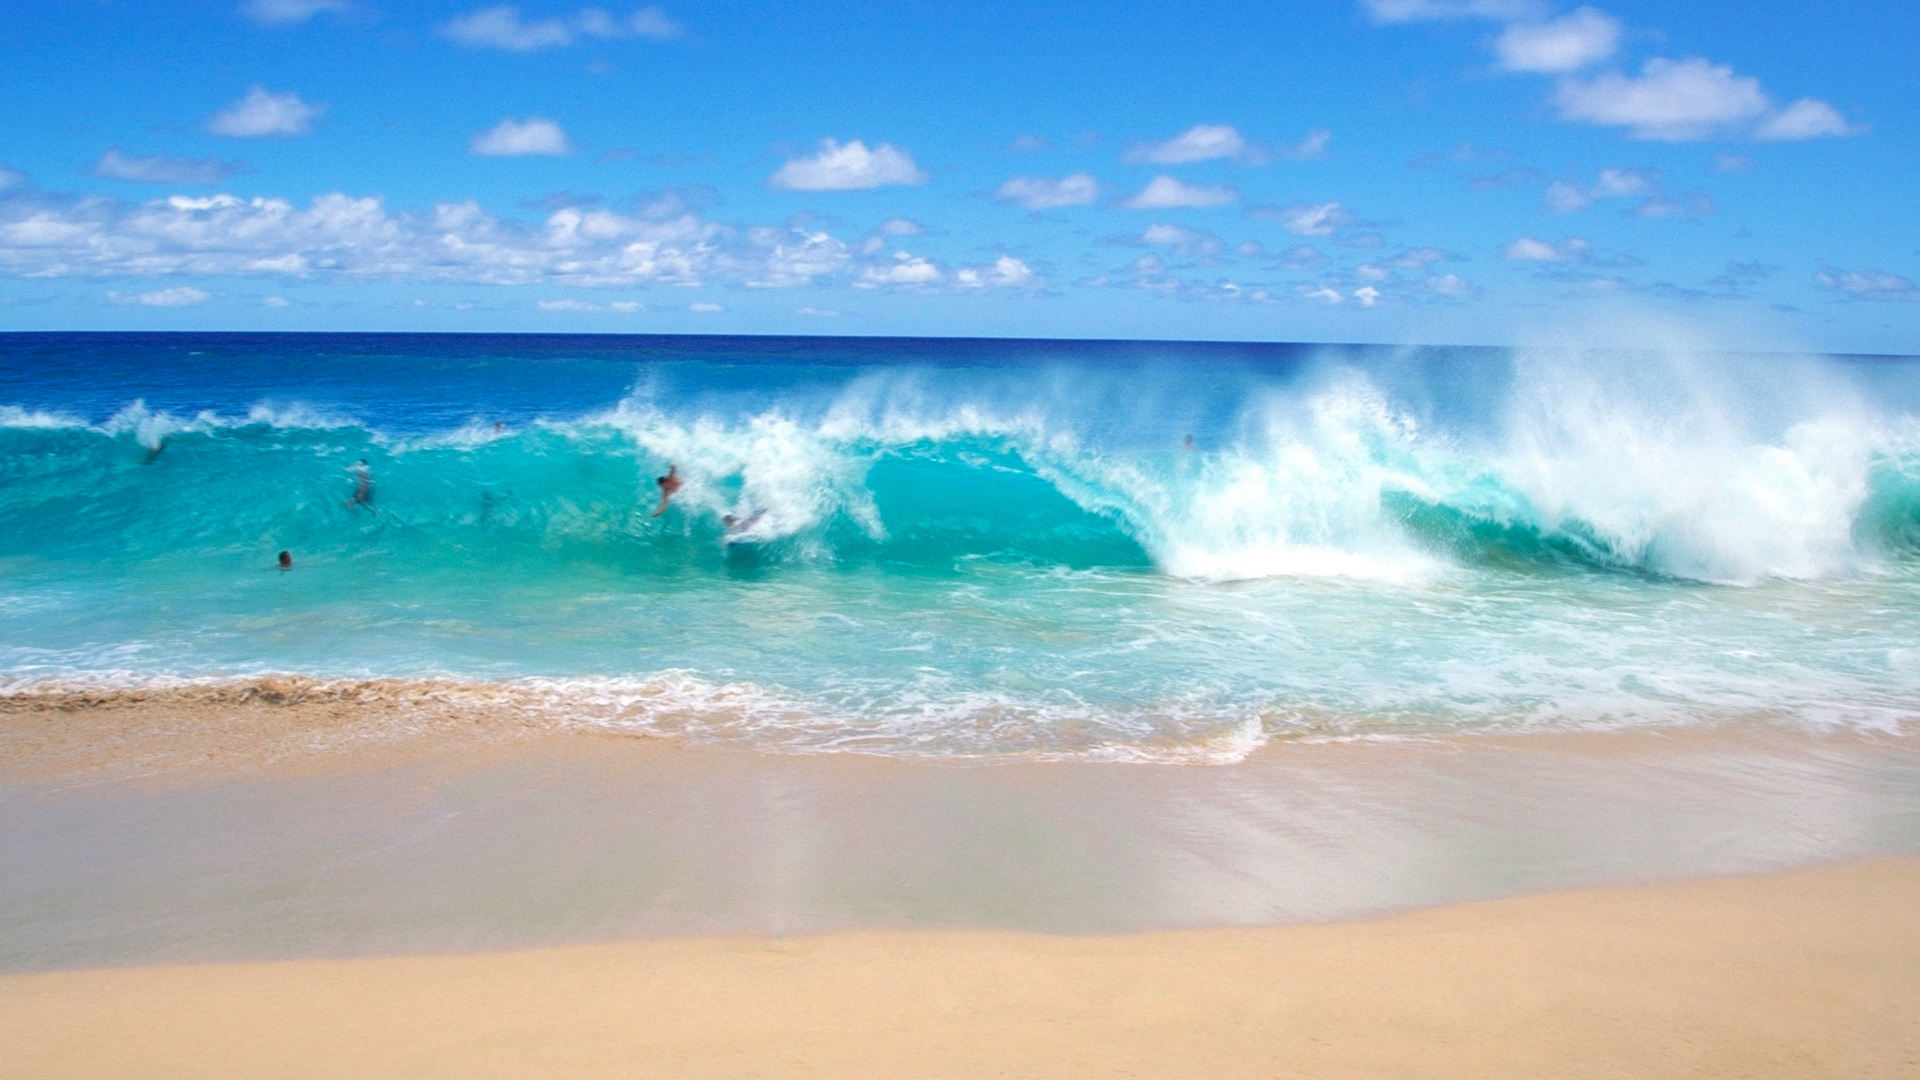 fun on the playful ocean waves wallpaper